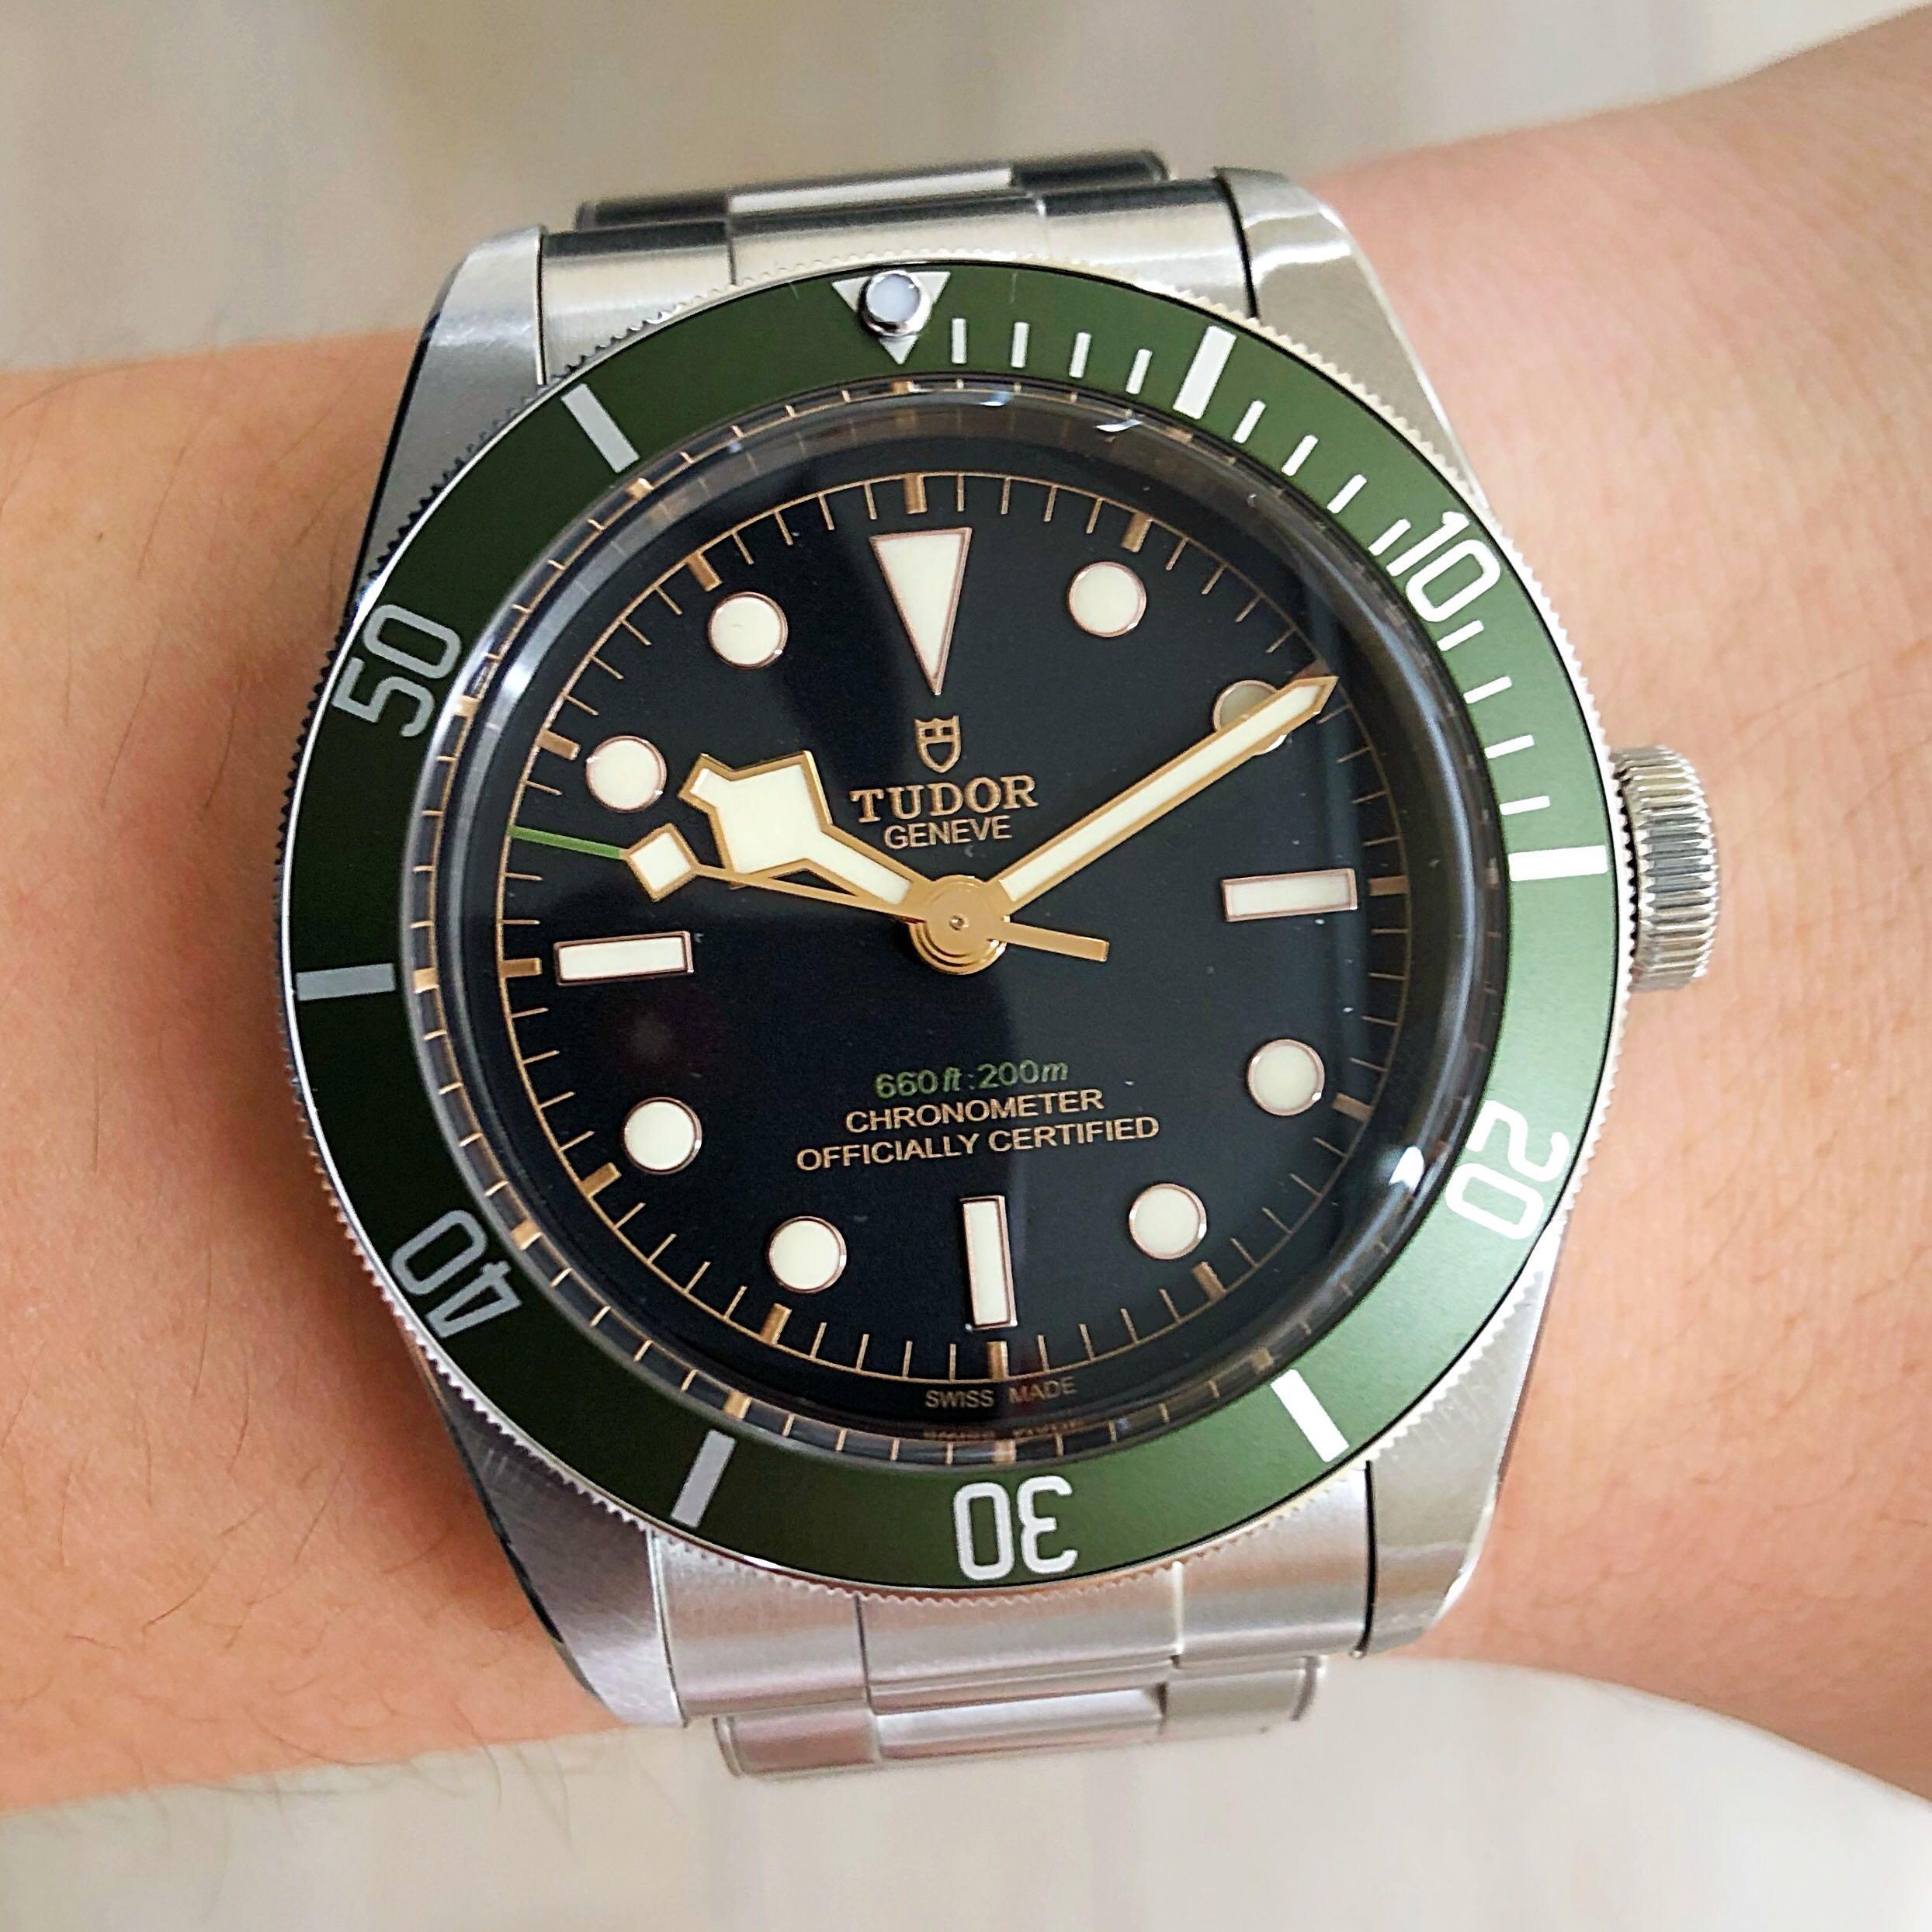 c8b015e4ad4 [ SOLD ] Tudor Black Bay Harrods, Luxury, Watches on Carousell